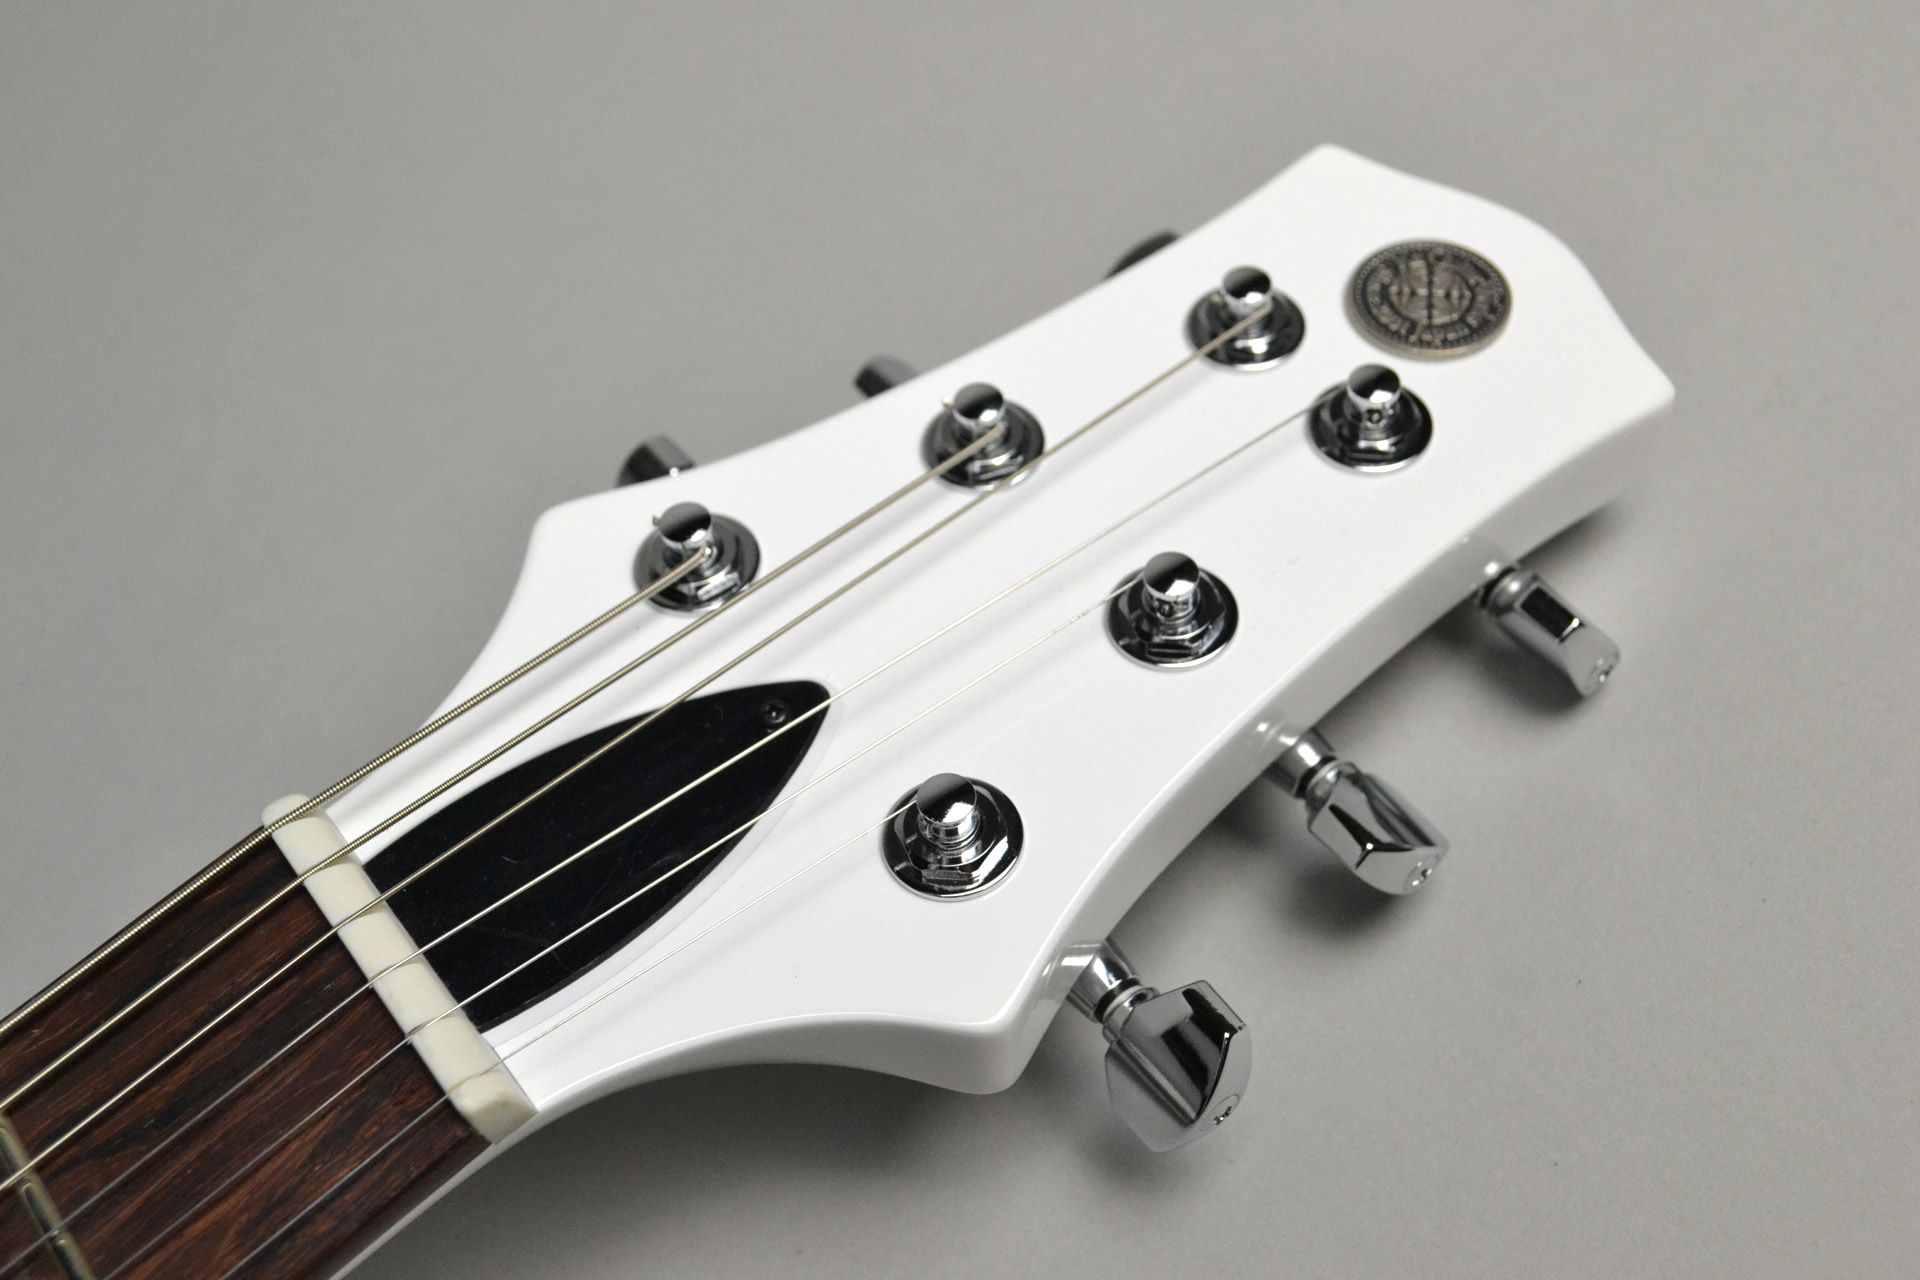 "Kz One Solid 3S23 Kahler Gloss White ""Standard Line""島村楽器限定モデルのヘッド裏-アップ画像"